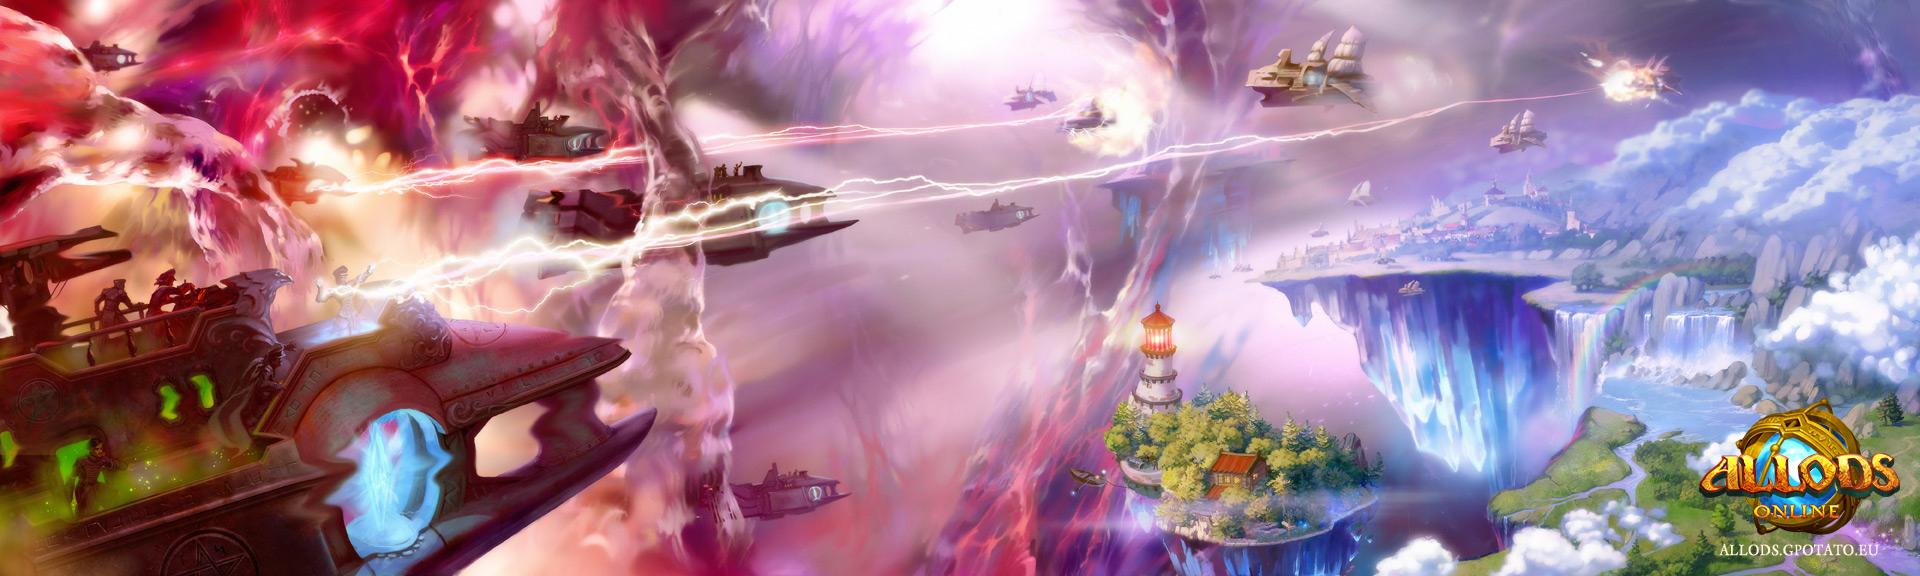 Bataille dans l'Astral